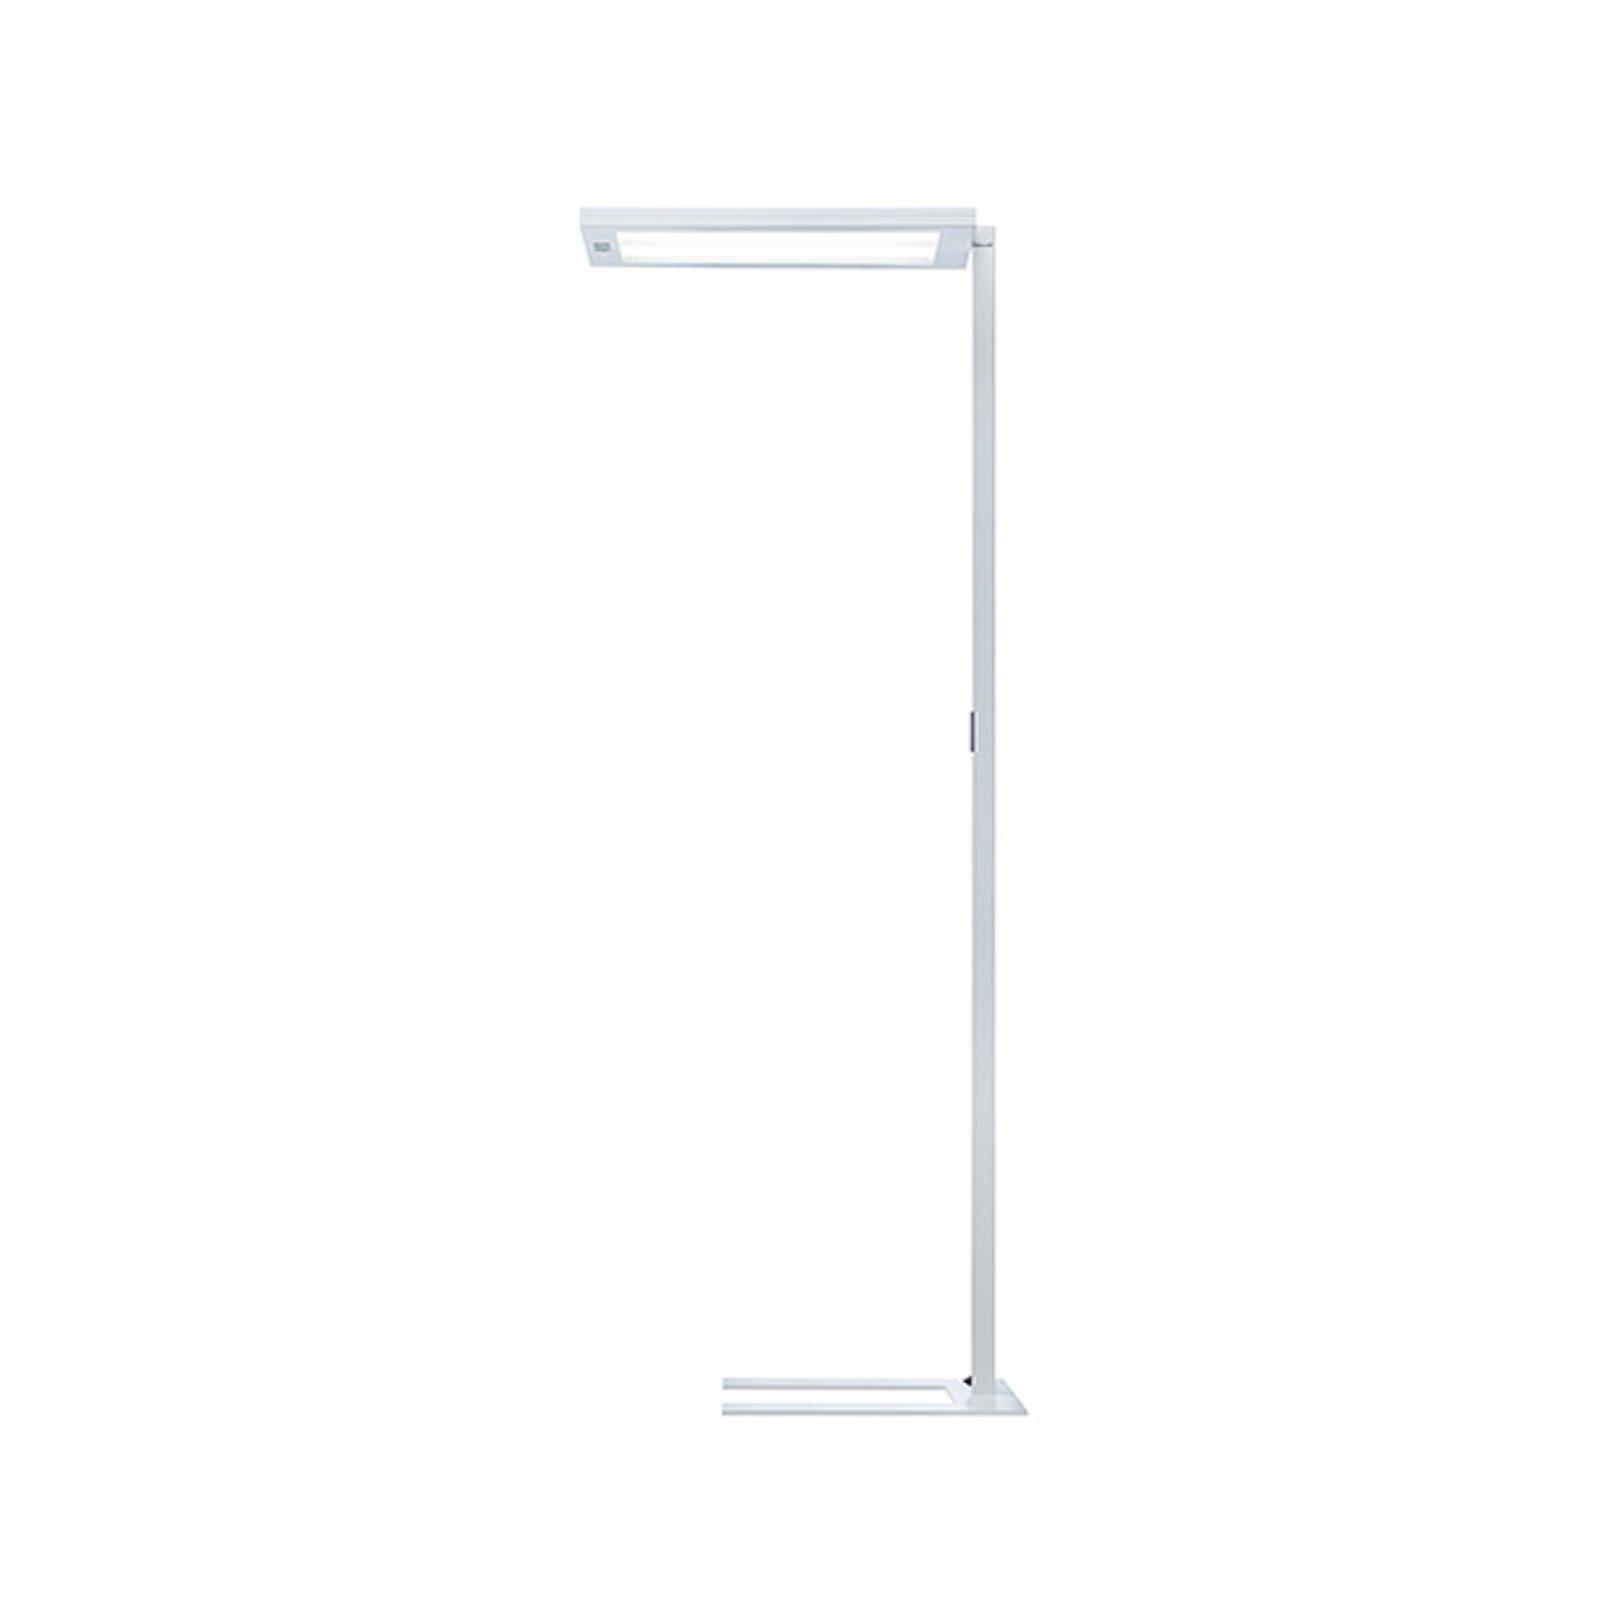 LED-gulvlampe Lavigo, DPS 14000/840/R/G2 102W